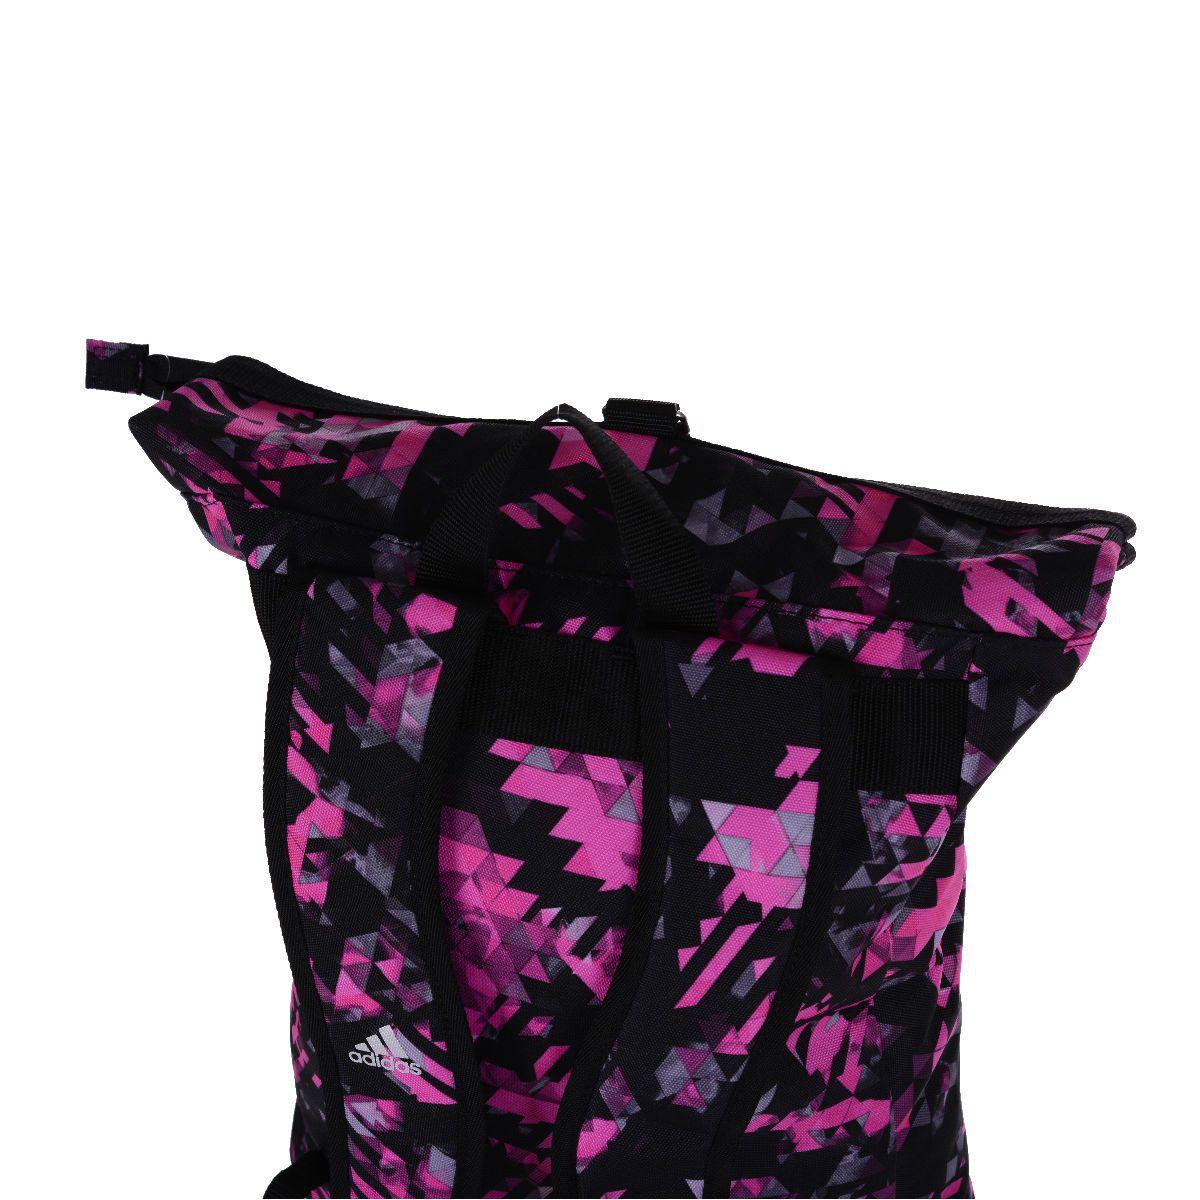 Mochila Adidas Boxing Camuflada Rosa/Prata 10 Litros